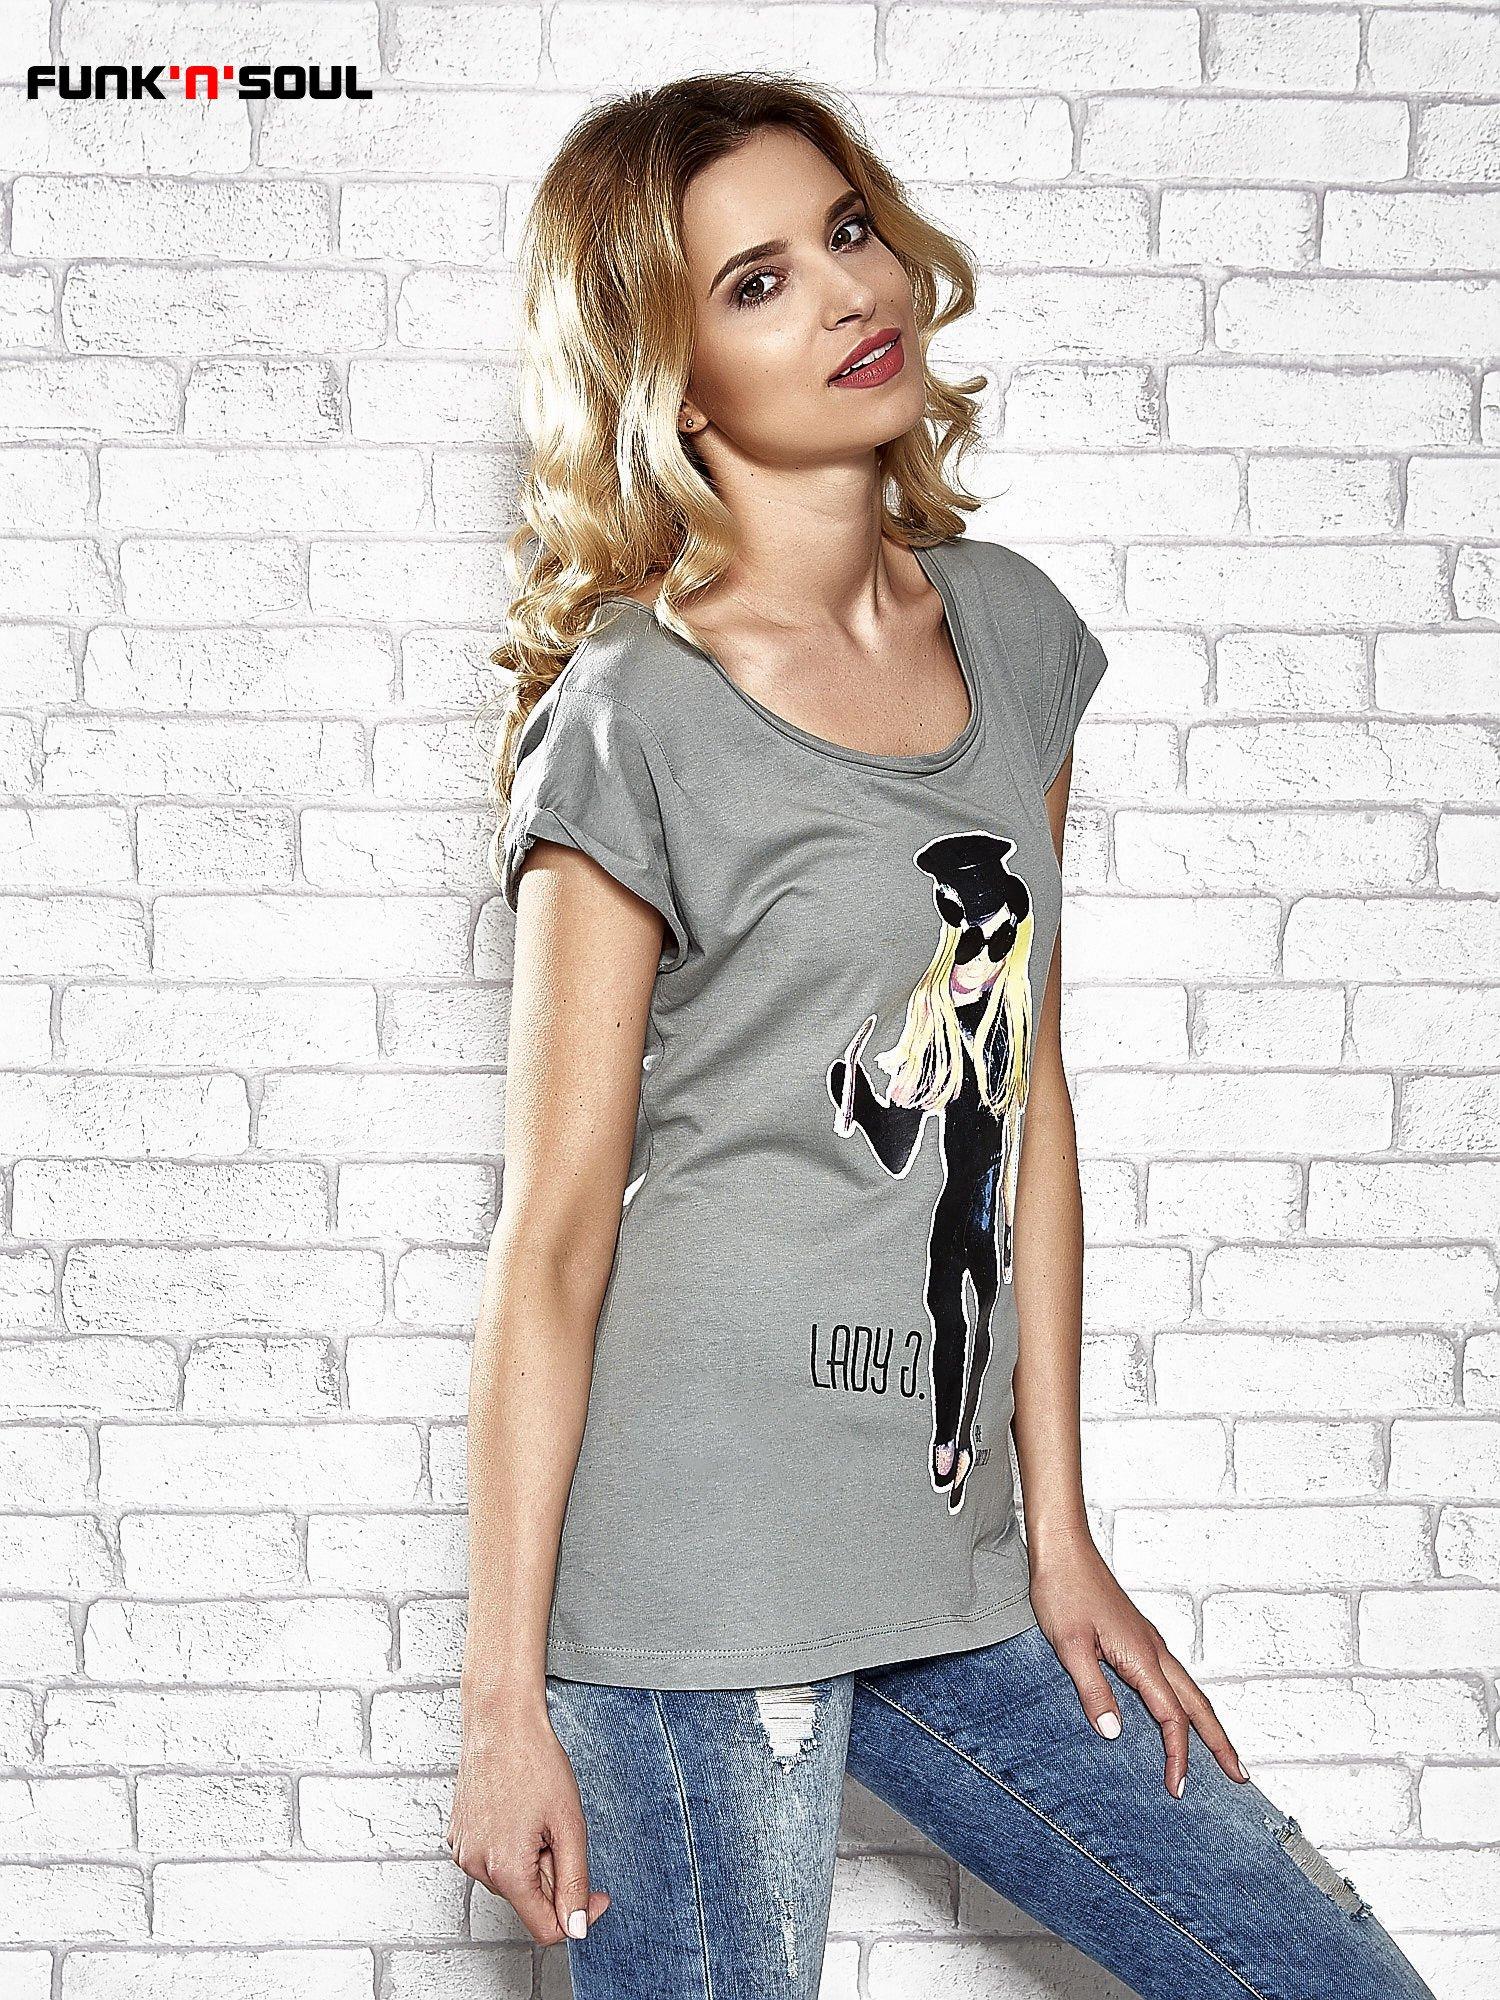 Szary t-shirt z nadrukiem Lady Gaga Funk n Soul                                  zdj.                                  3